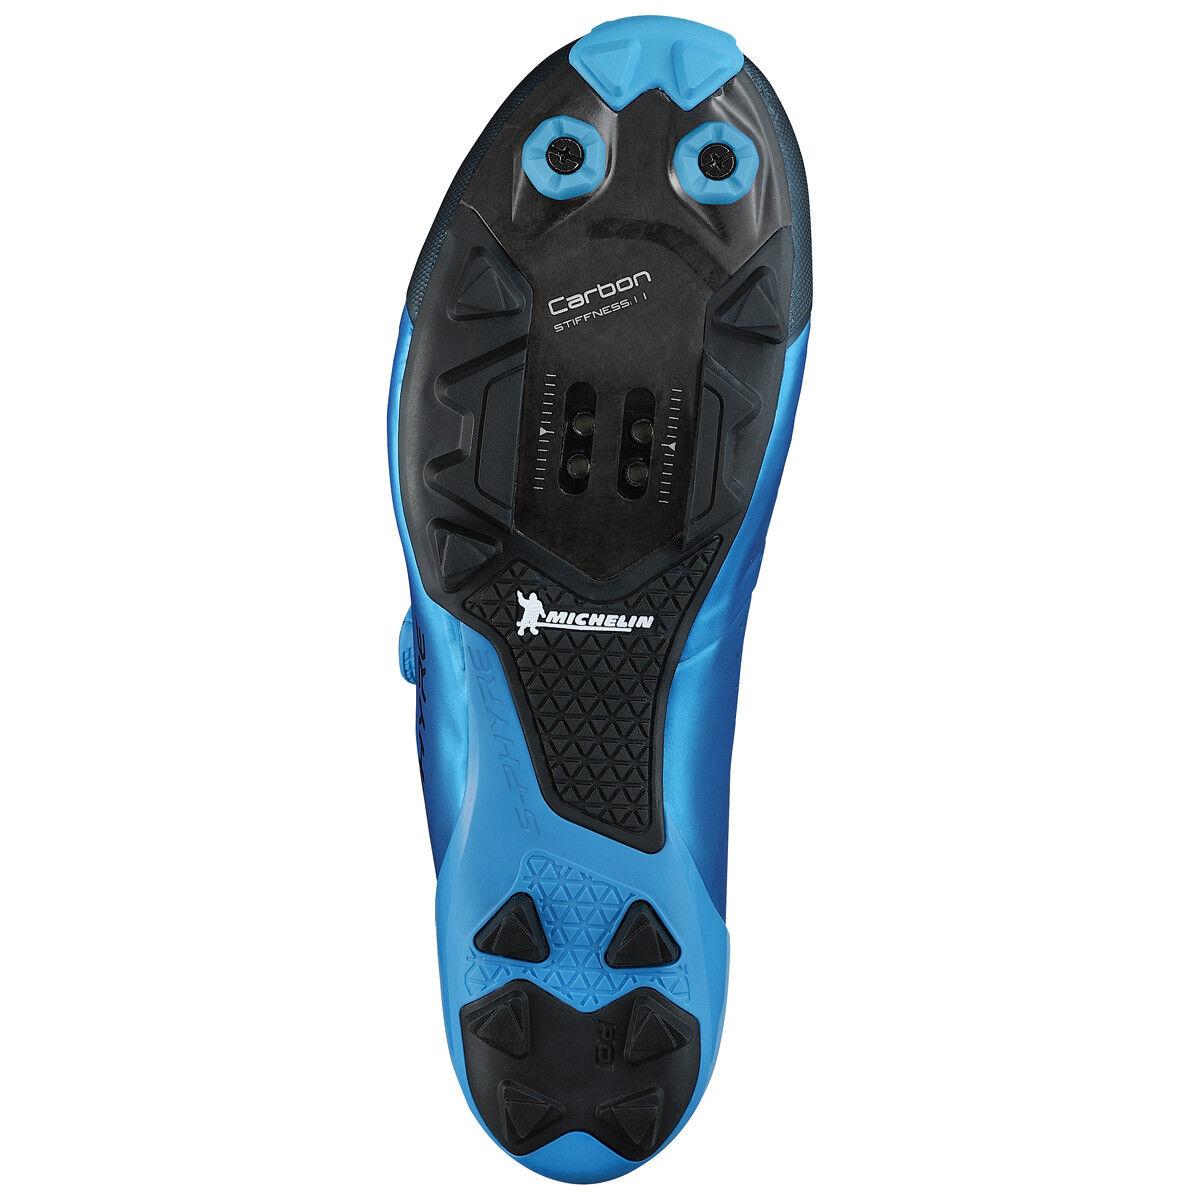 Schuhe bici bike schuhe Shimano S-PHYRE Blau XC9 blu XC900 blu XC9 carbon ciclismo mtb 2a6c43